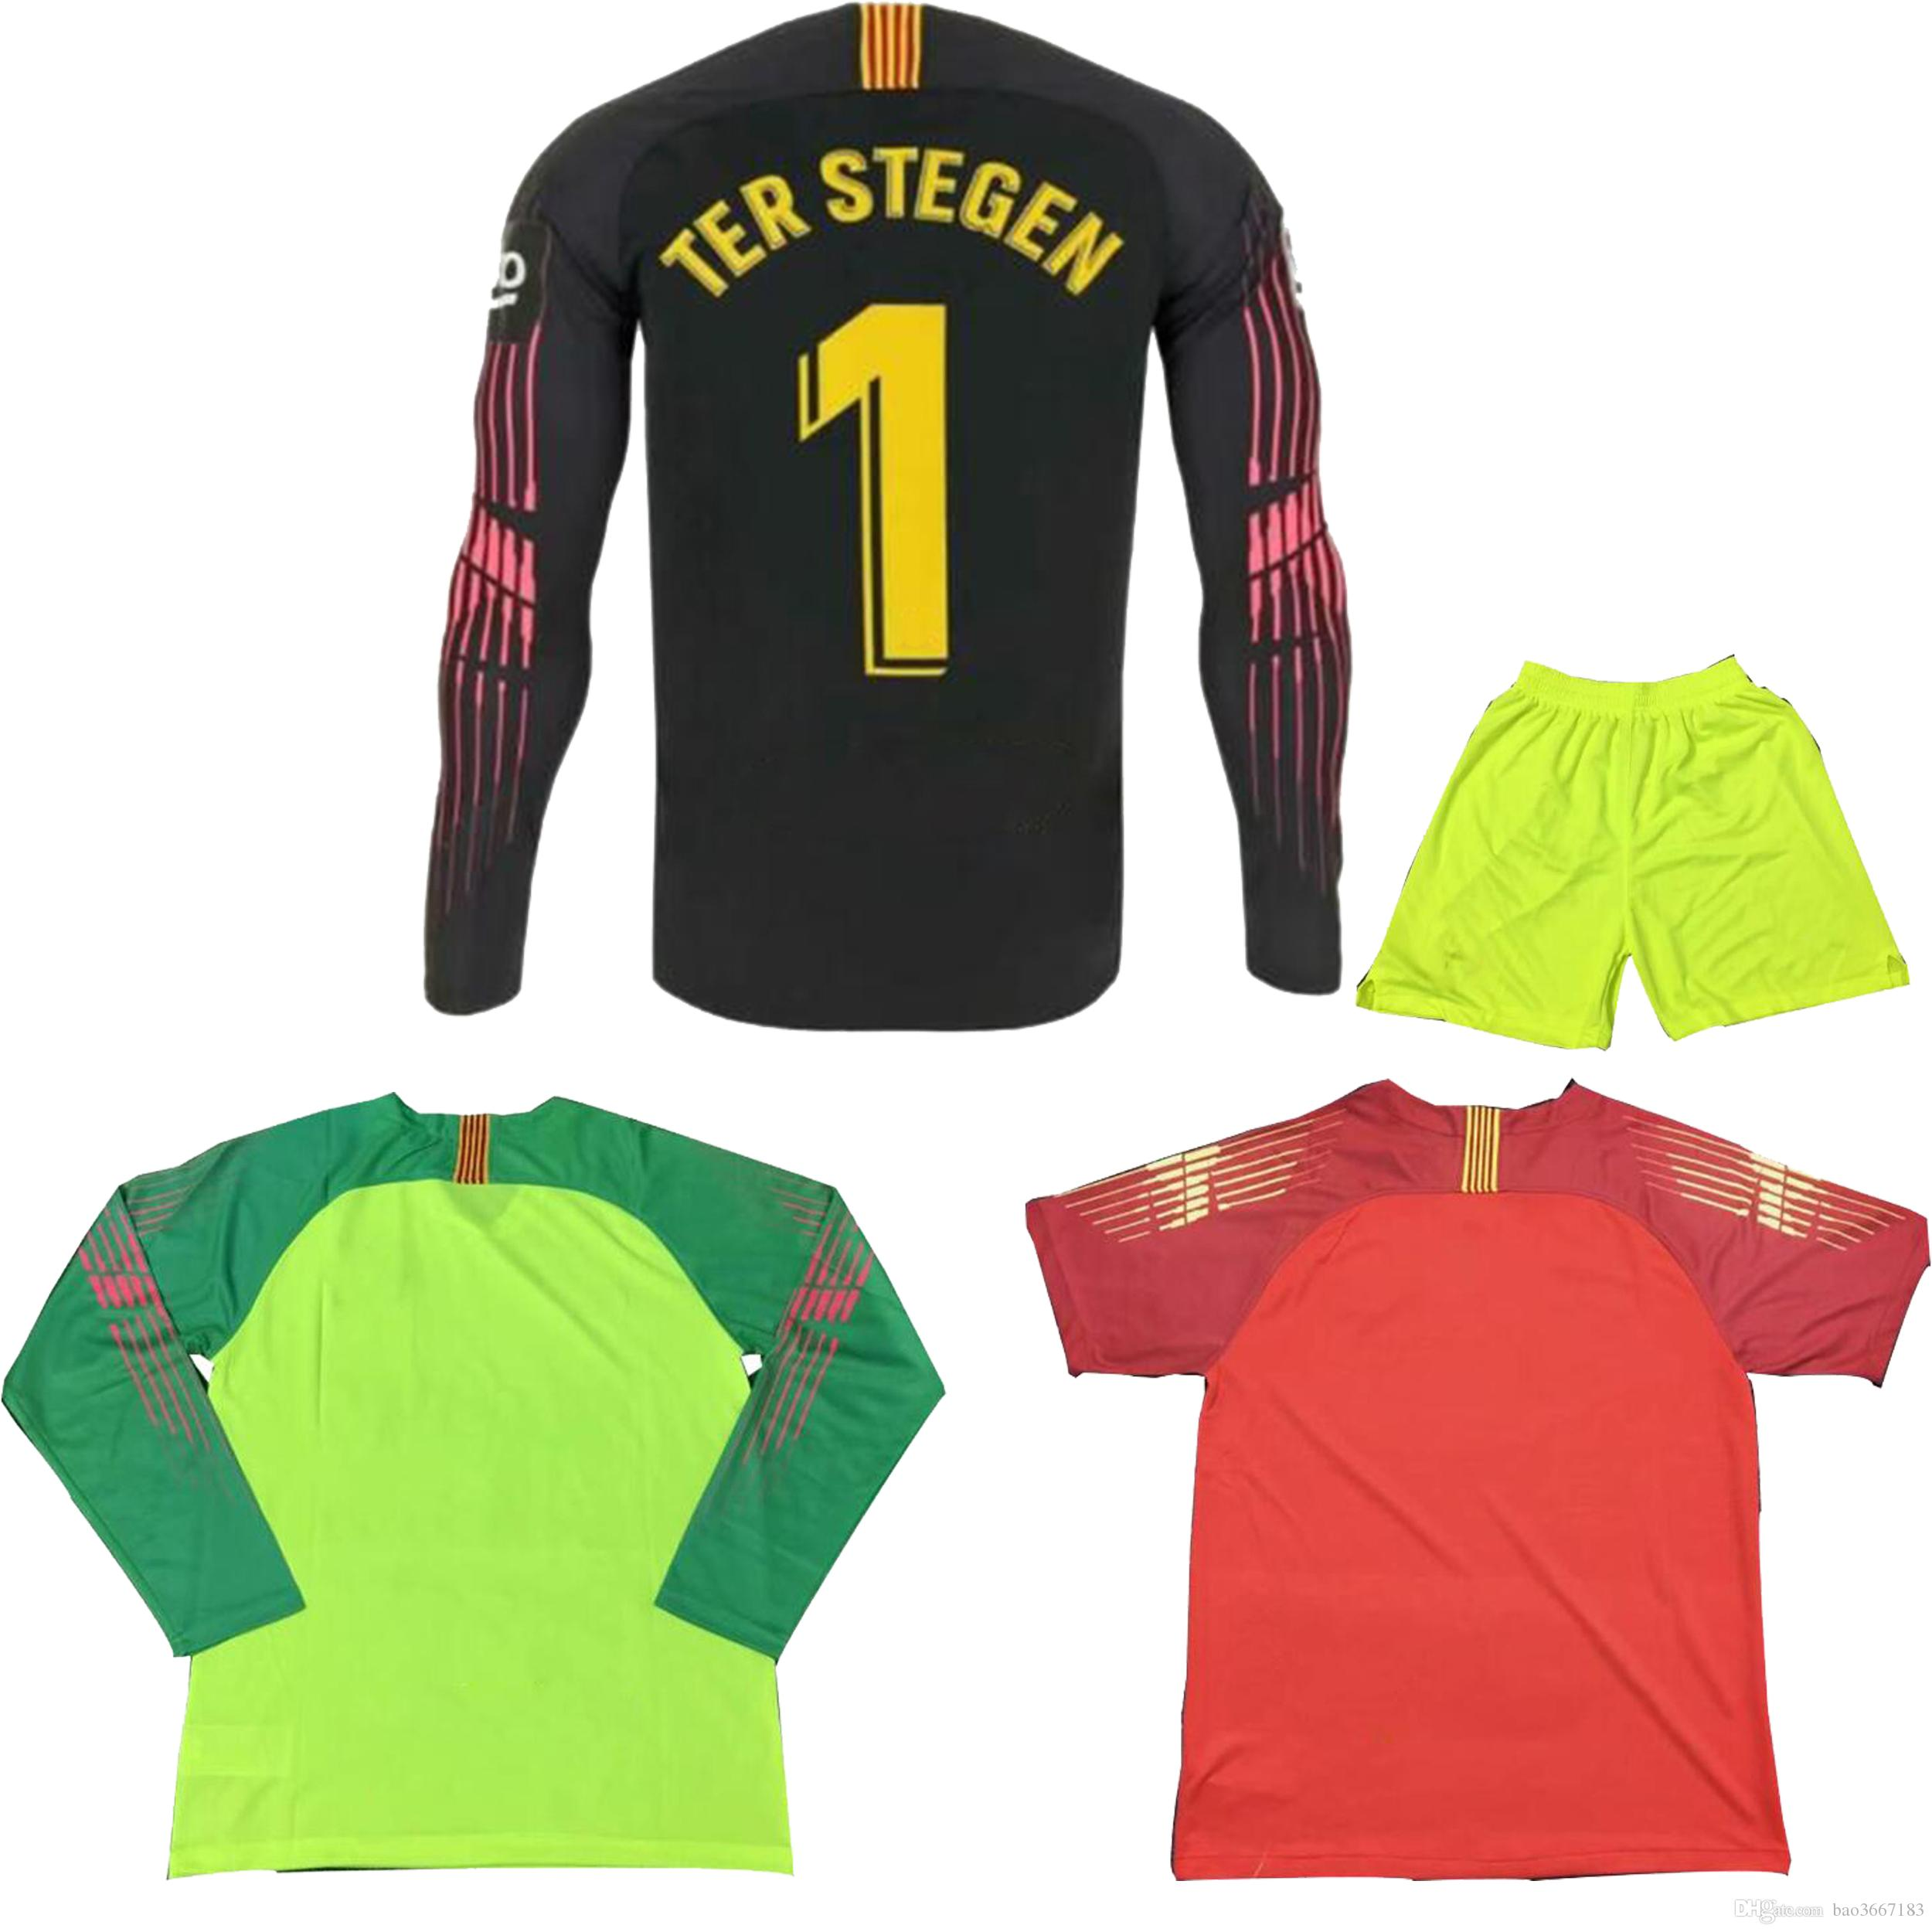 Compre Camiseta AAA + Calidad Tailandesa 2018 2019 Camiseta De Portero De  Manga Larga 2018 TER STEGEN CILLESSEN 2018 2019 Camiseta De Fútbol De  Portero De ... dade2cb257261